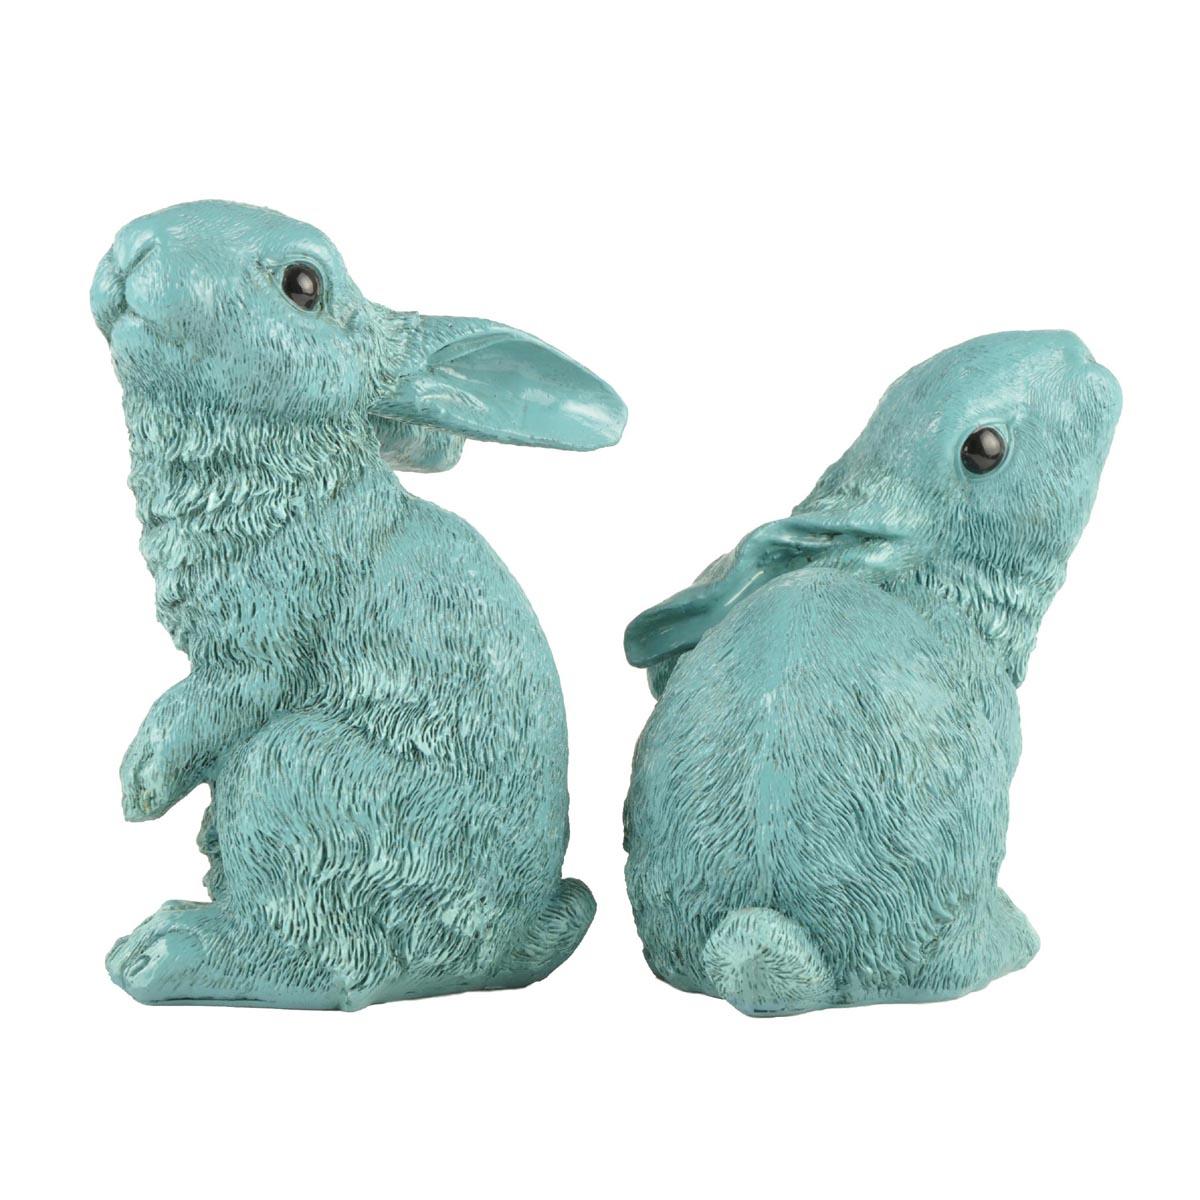 Ennas vintage easter bunny figurines oem micro landscape-2